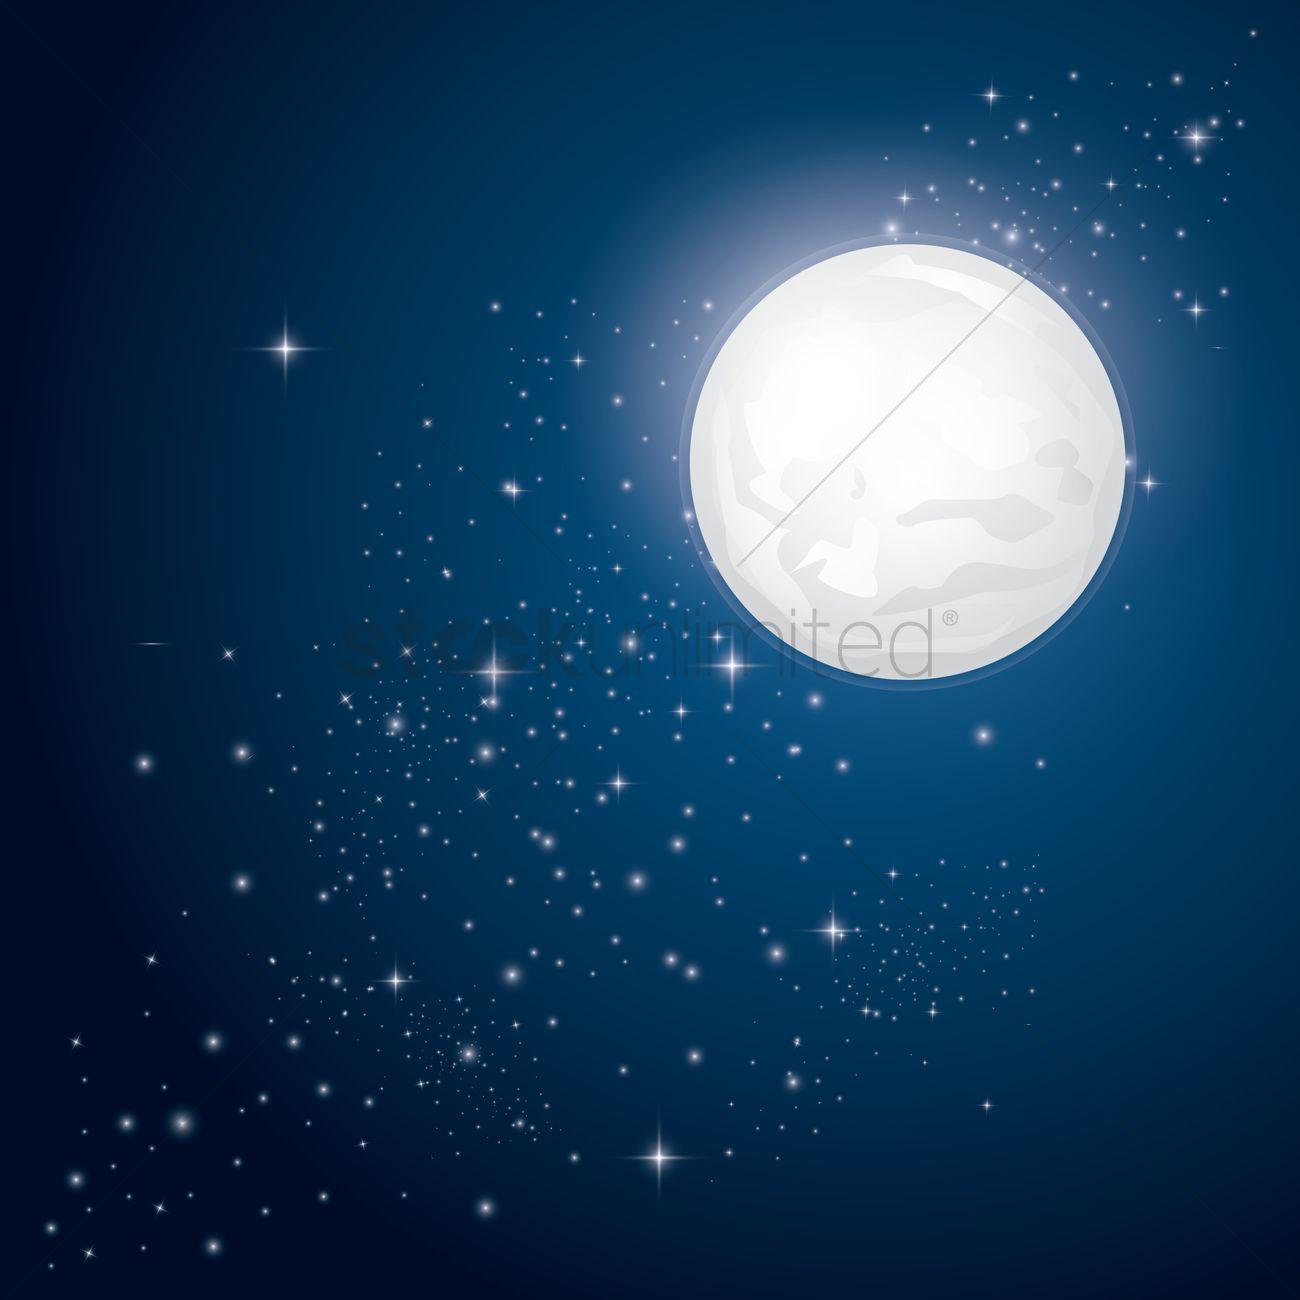 Image Gallery nighttime stars background